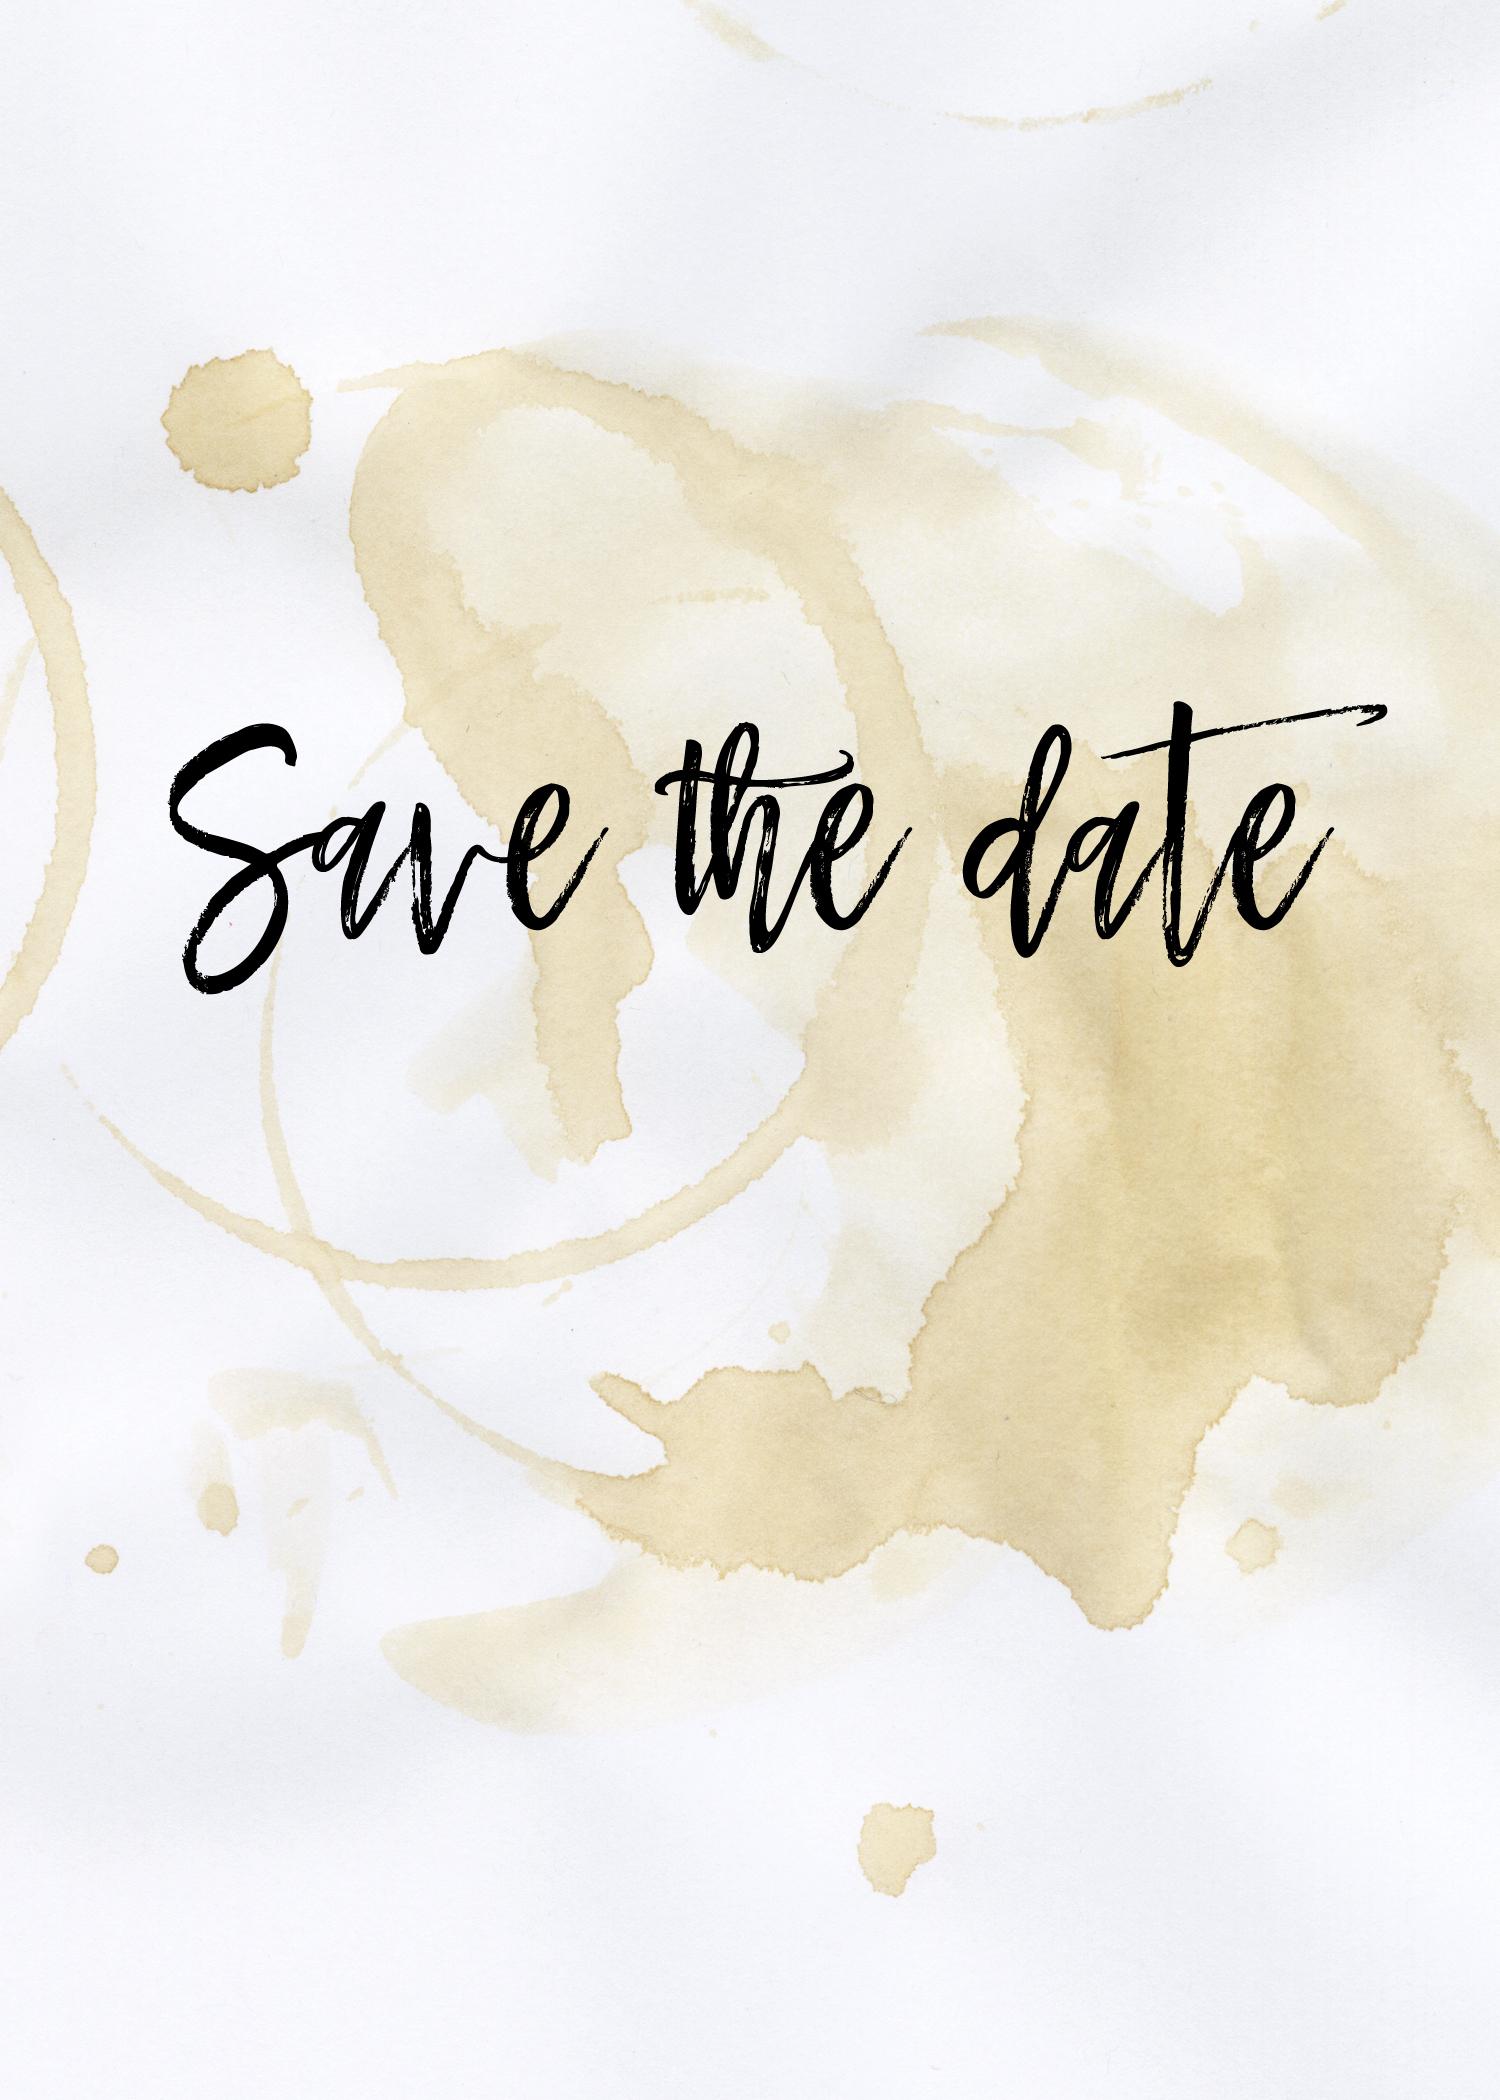 Coffee Save The Date Invitation Template Lovely Free Printable Save - Free Printable Save The Date Invitation Templates